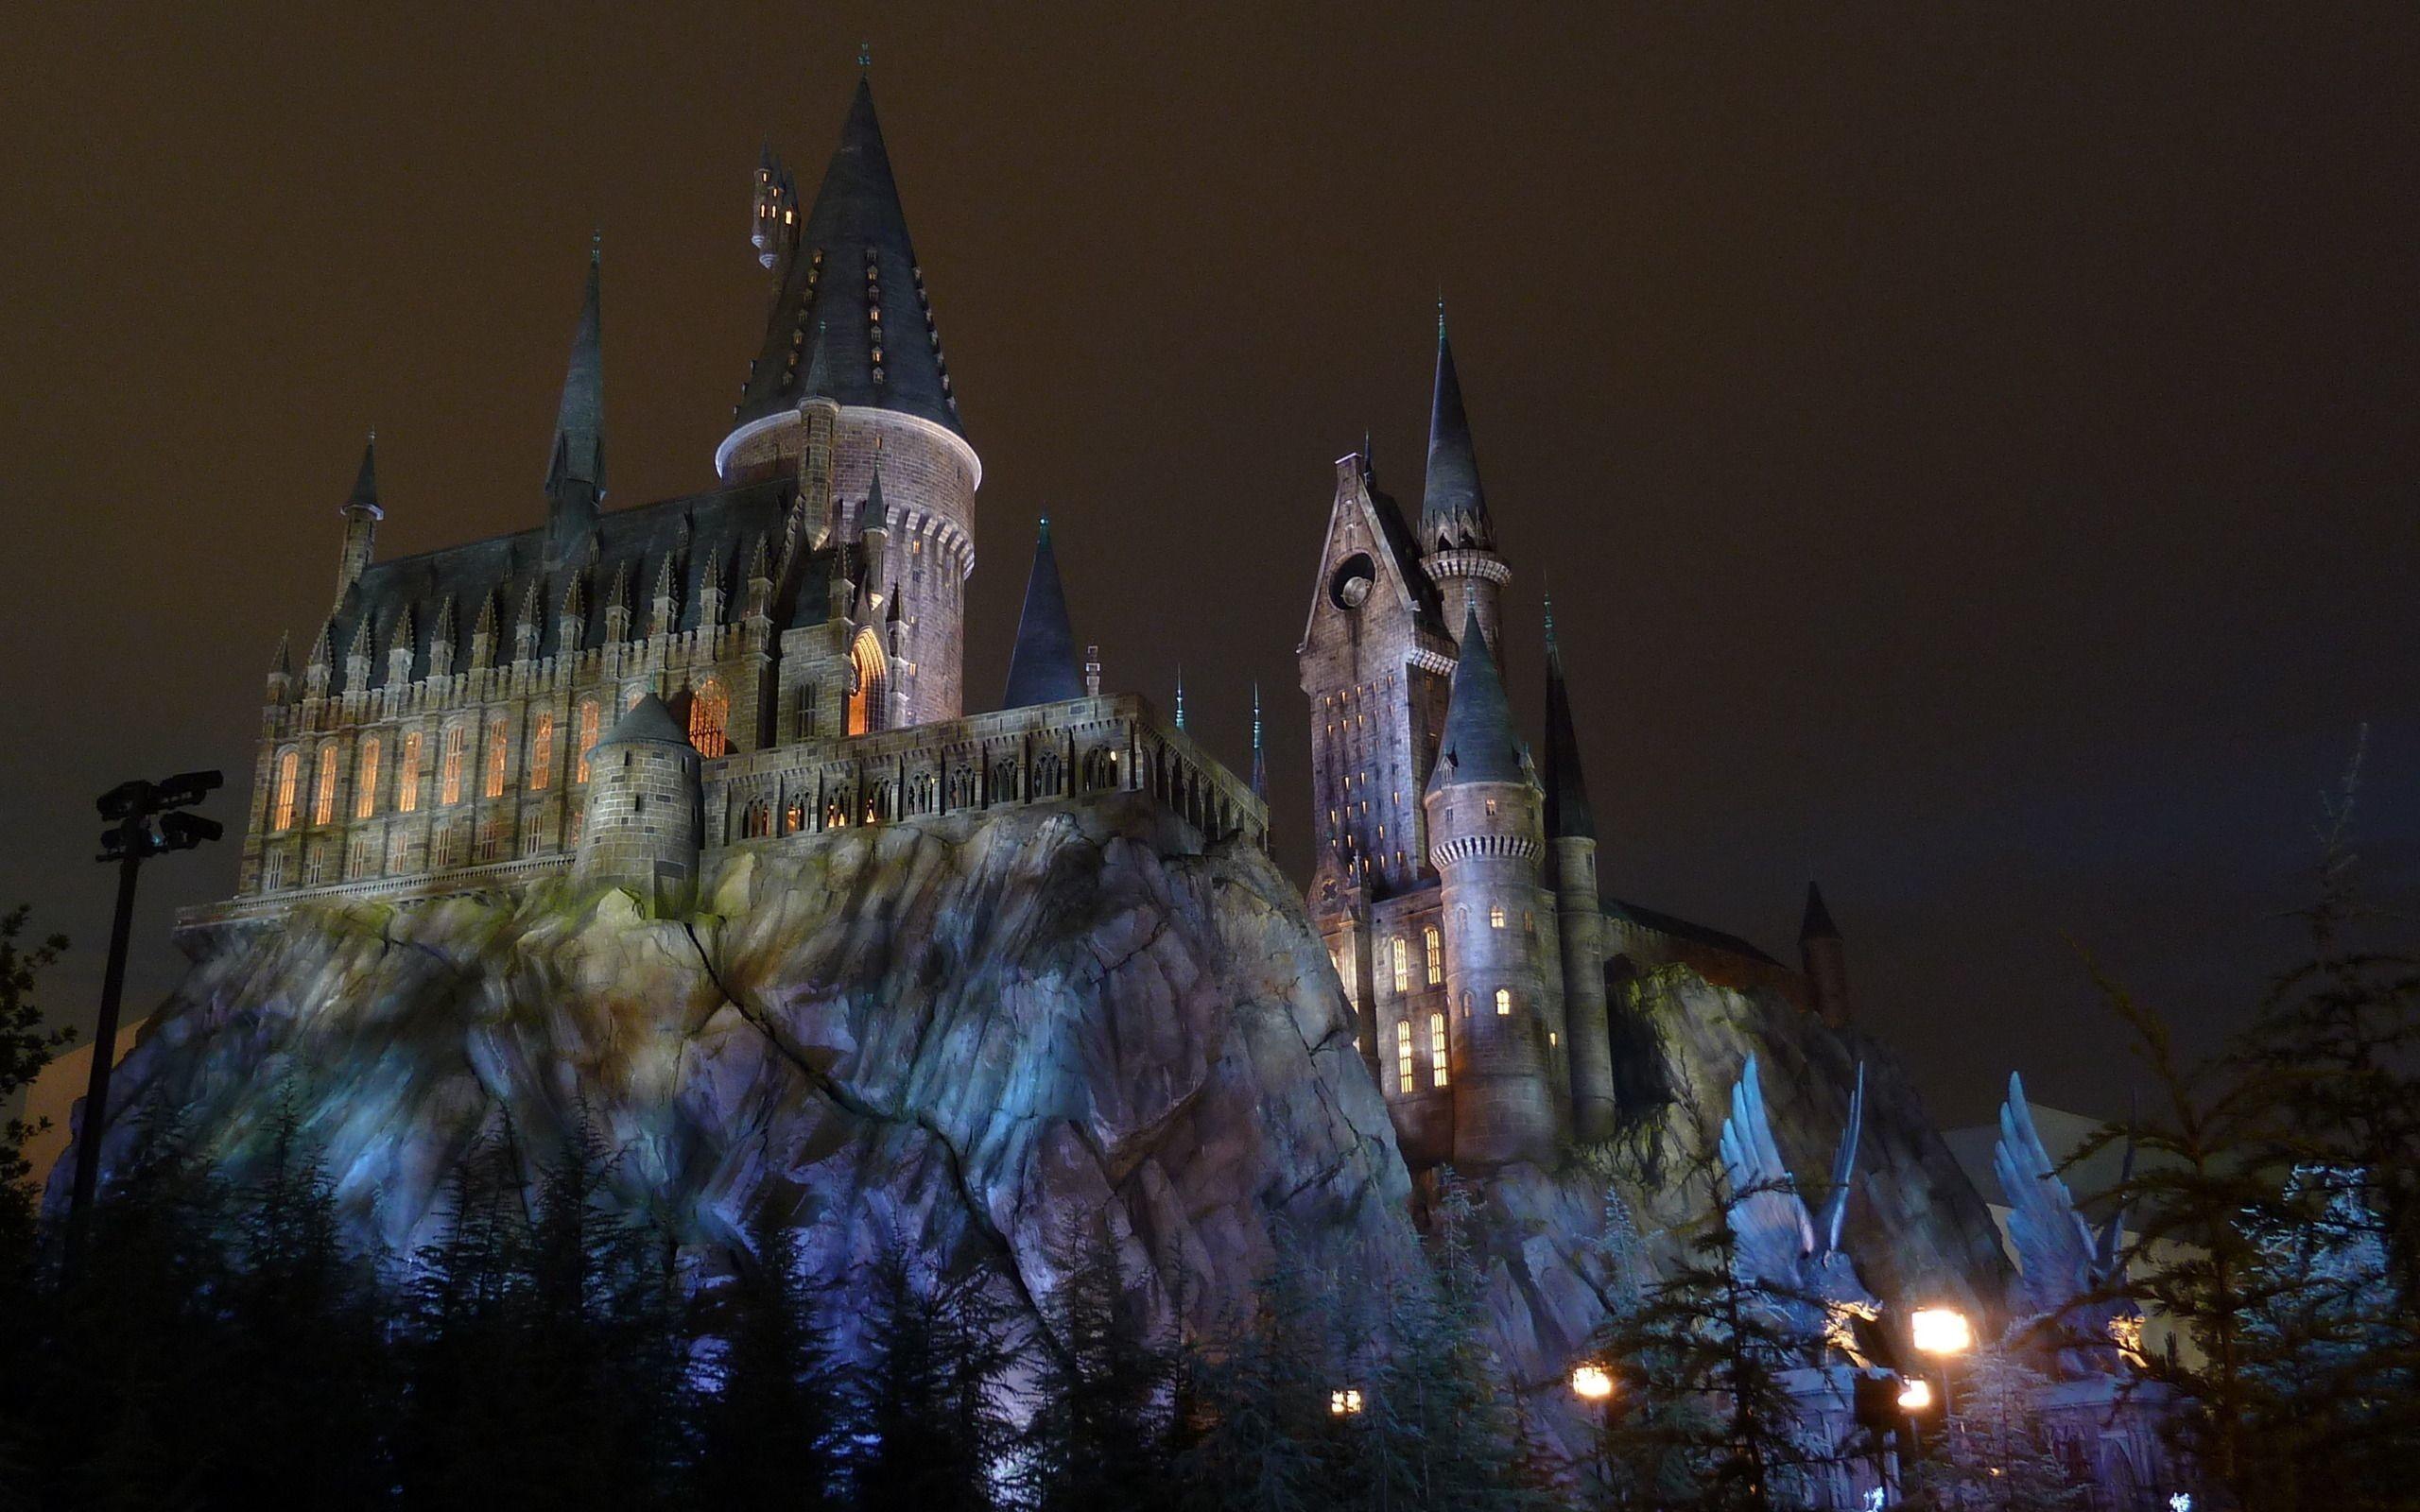 2560x1600 Wallpaper Wiki Hogwarts Castle Wallpapers Hd Pic Wpe003663